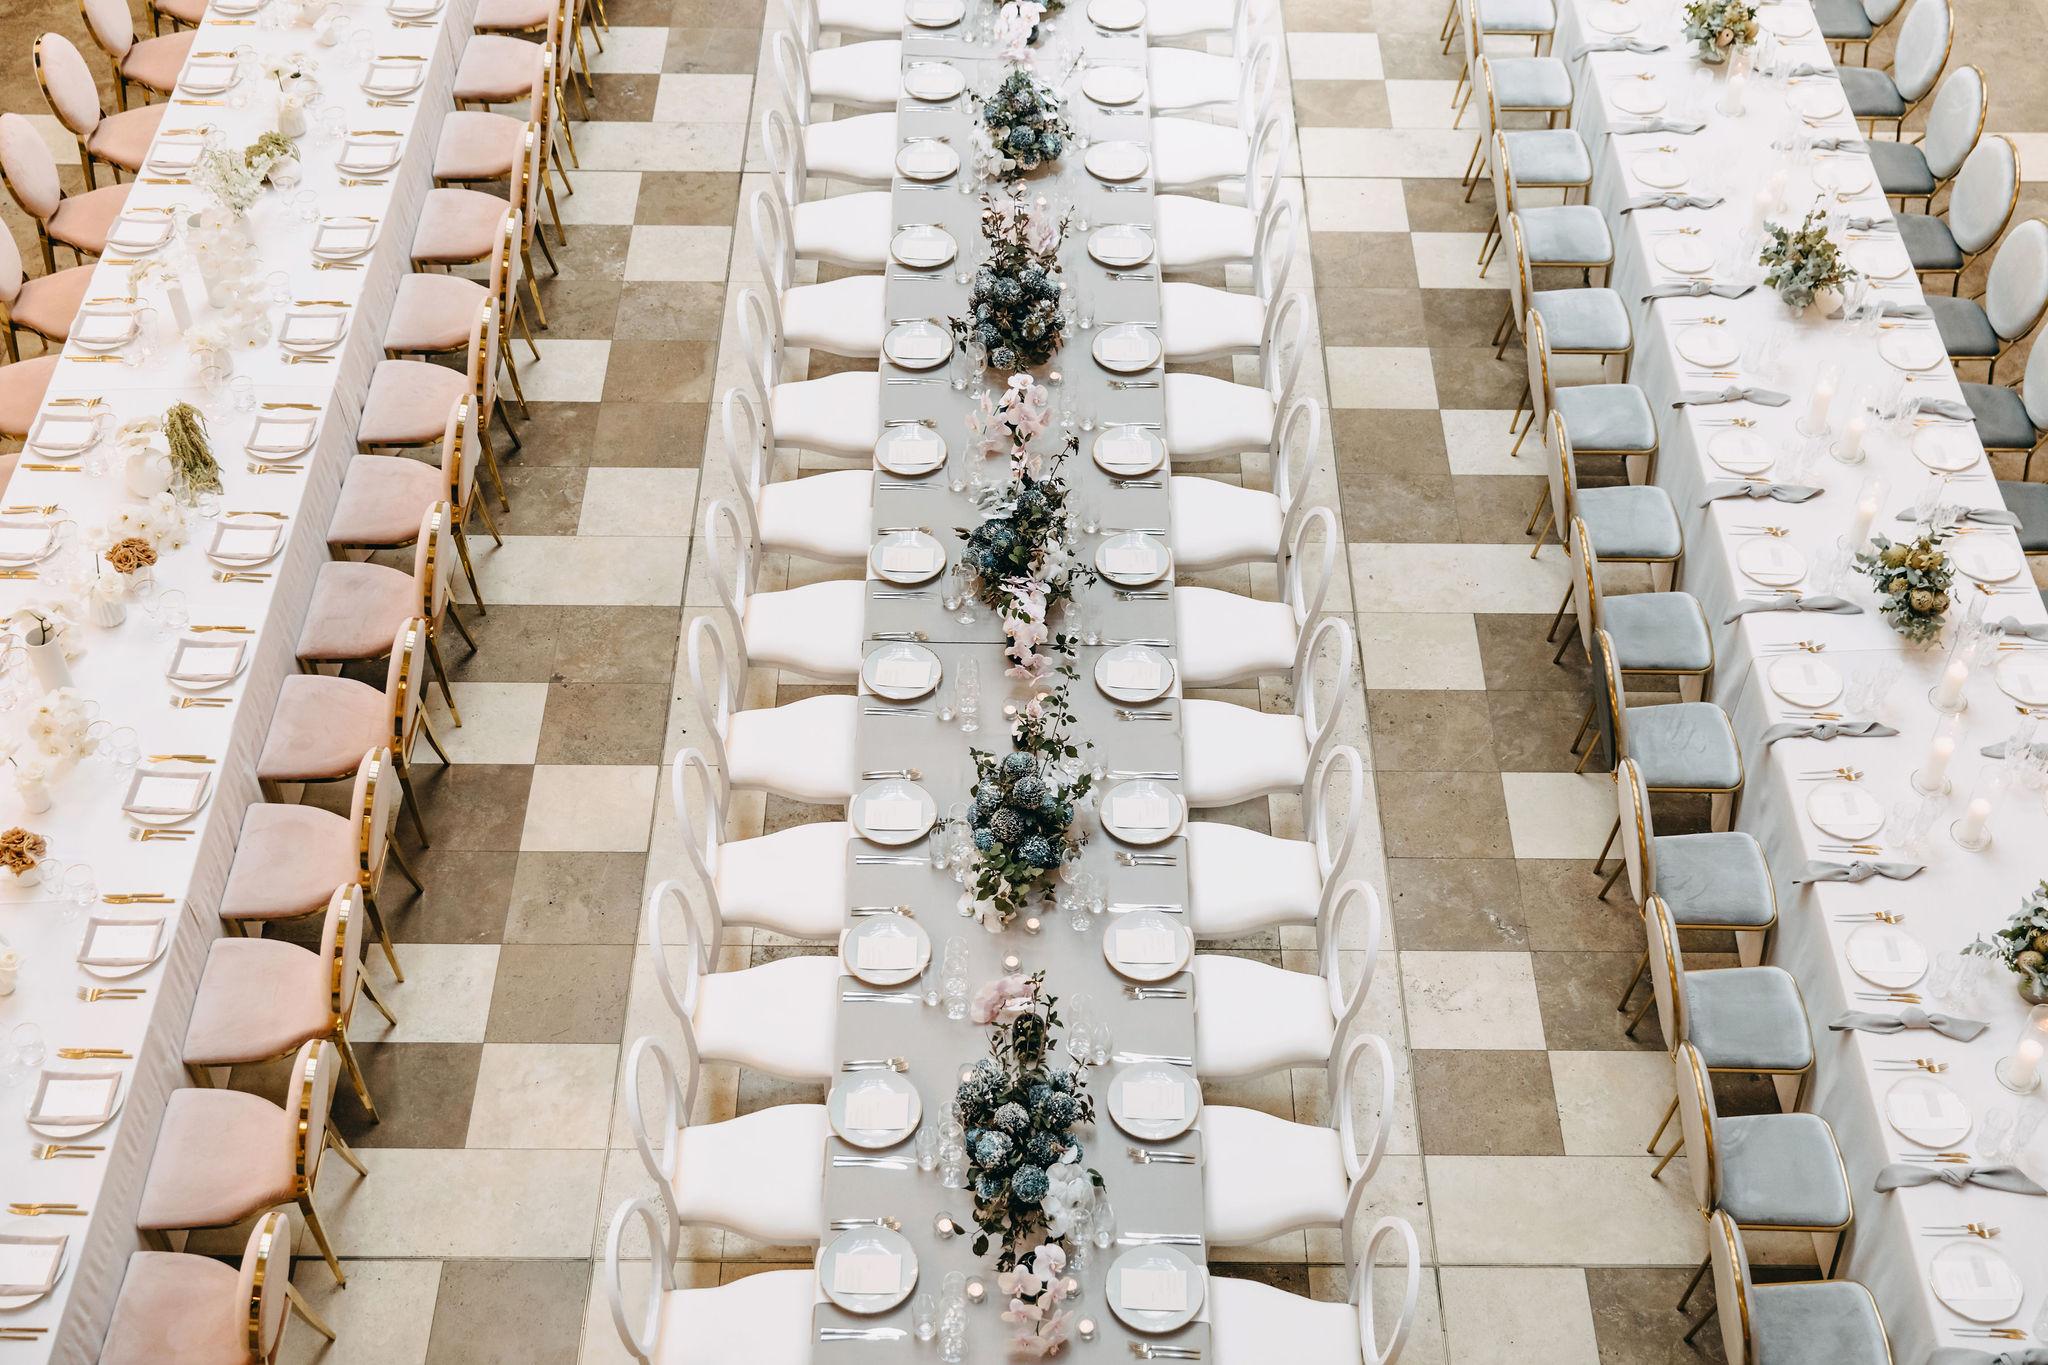 STATEBUILDINGS-WEDDINGOPENDAY-2019_SUPPLIED_080